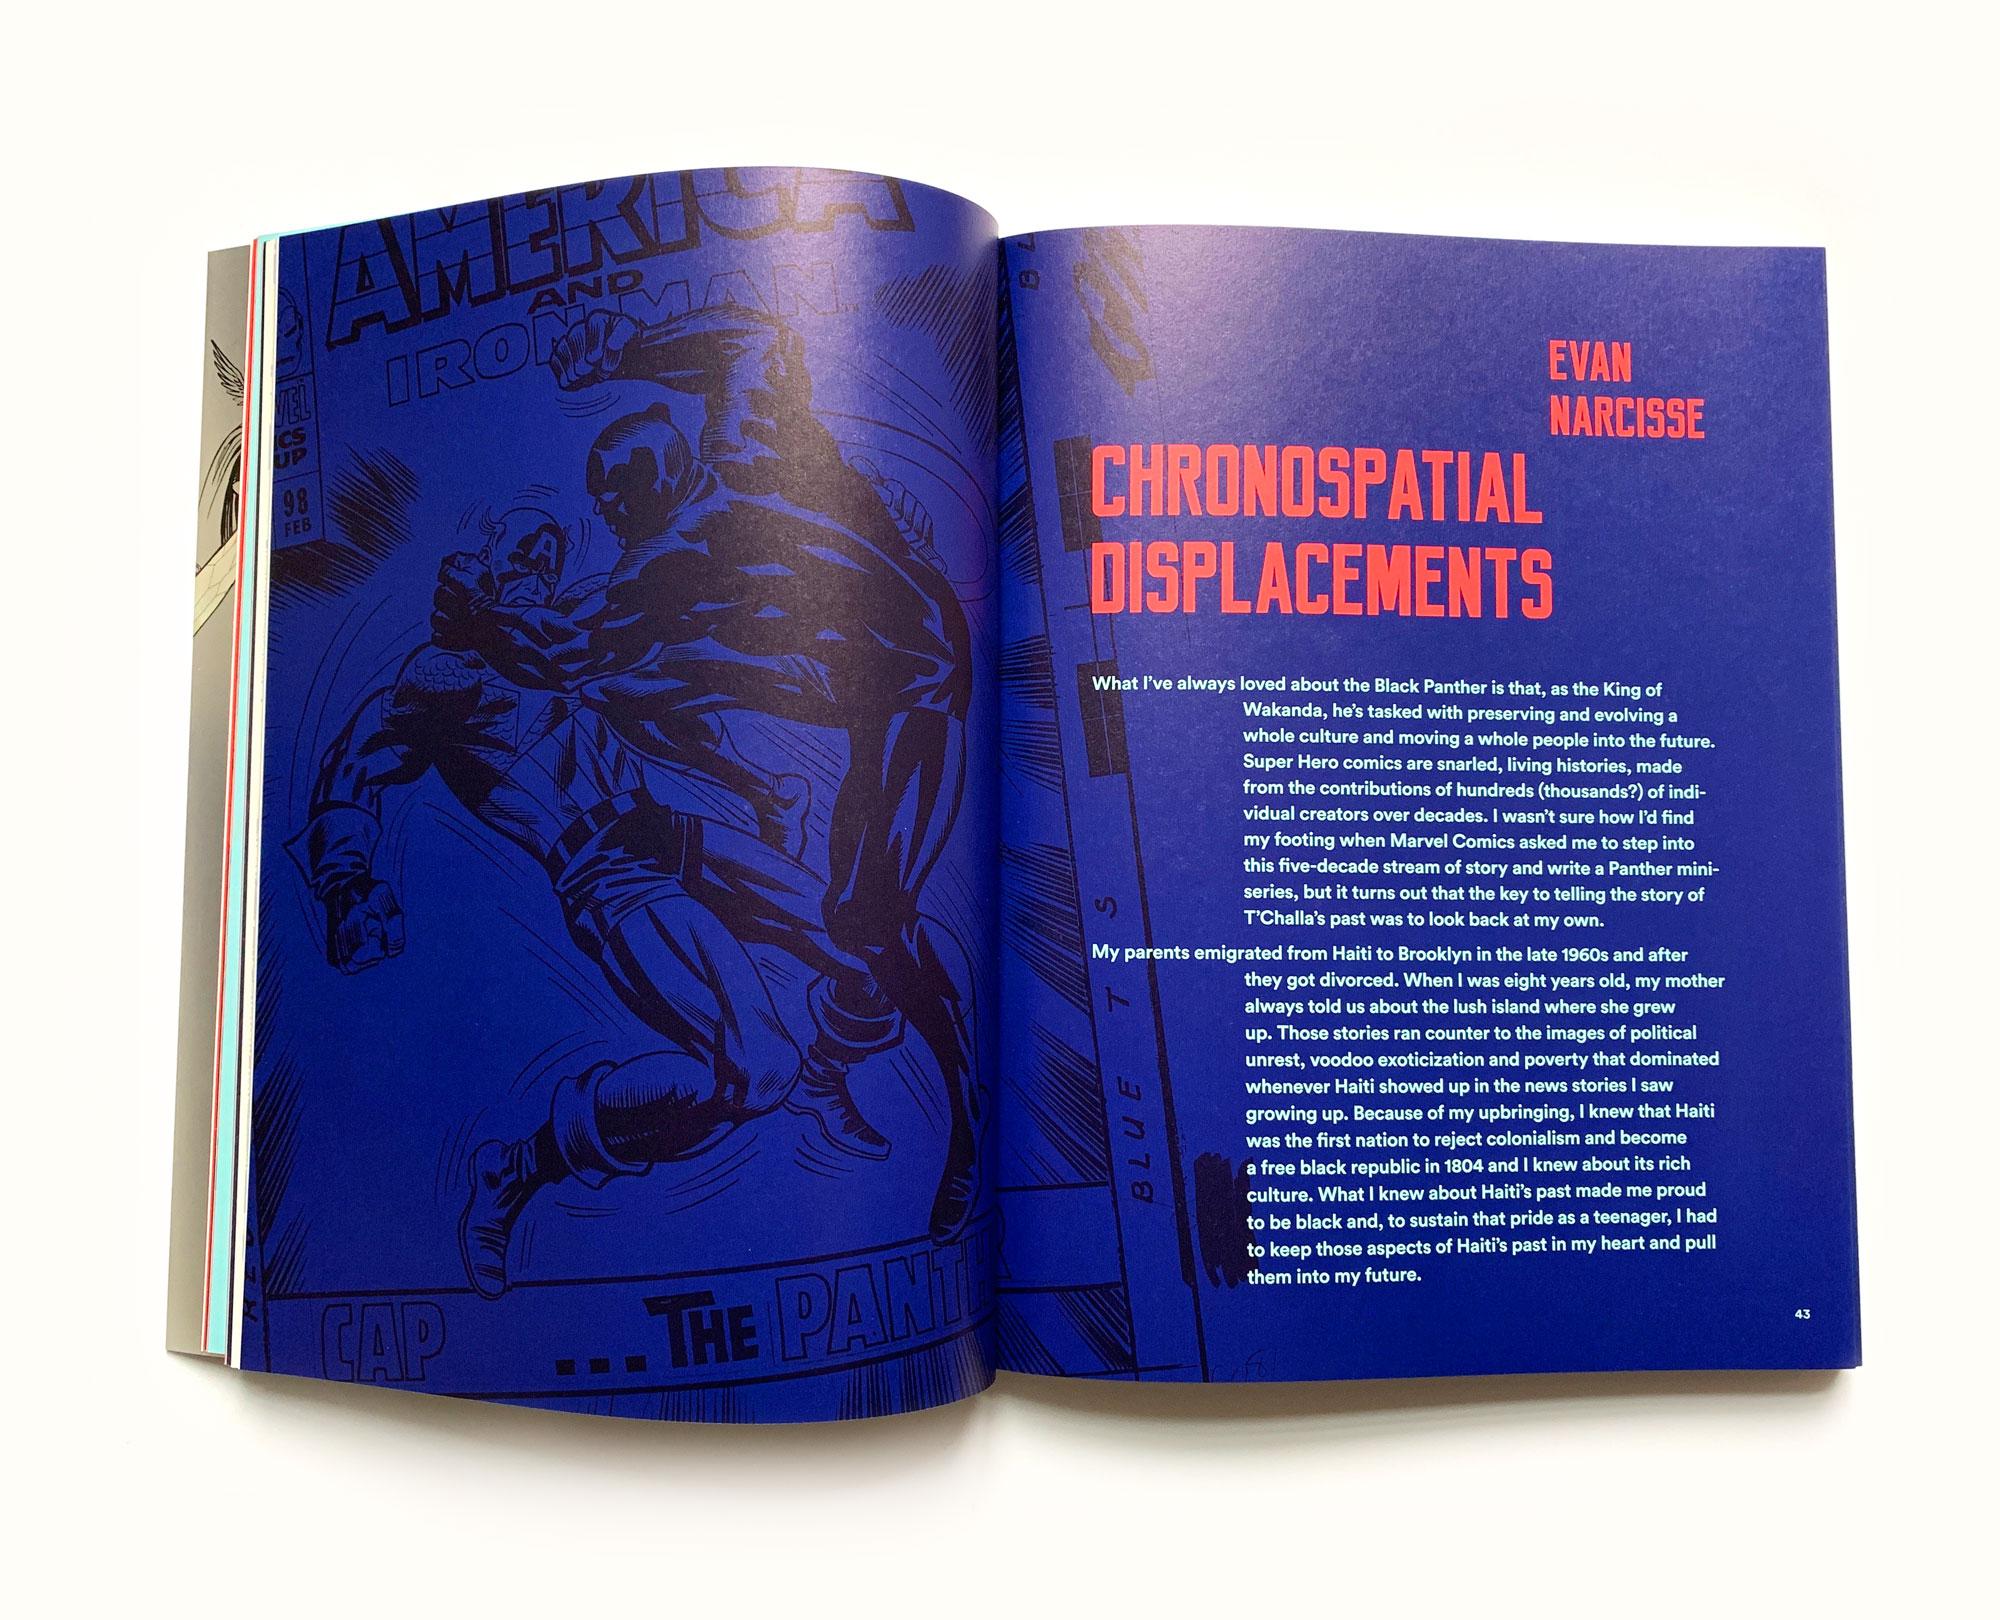 Marvel-Universe-of-Super-Heroes-Book-Balgavy-Avengers-BlackPanther1.jpg